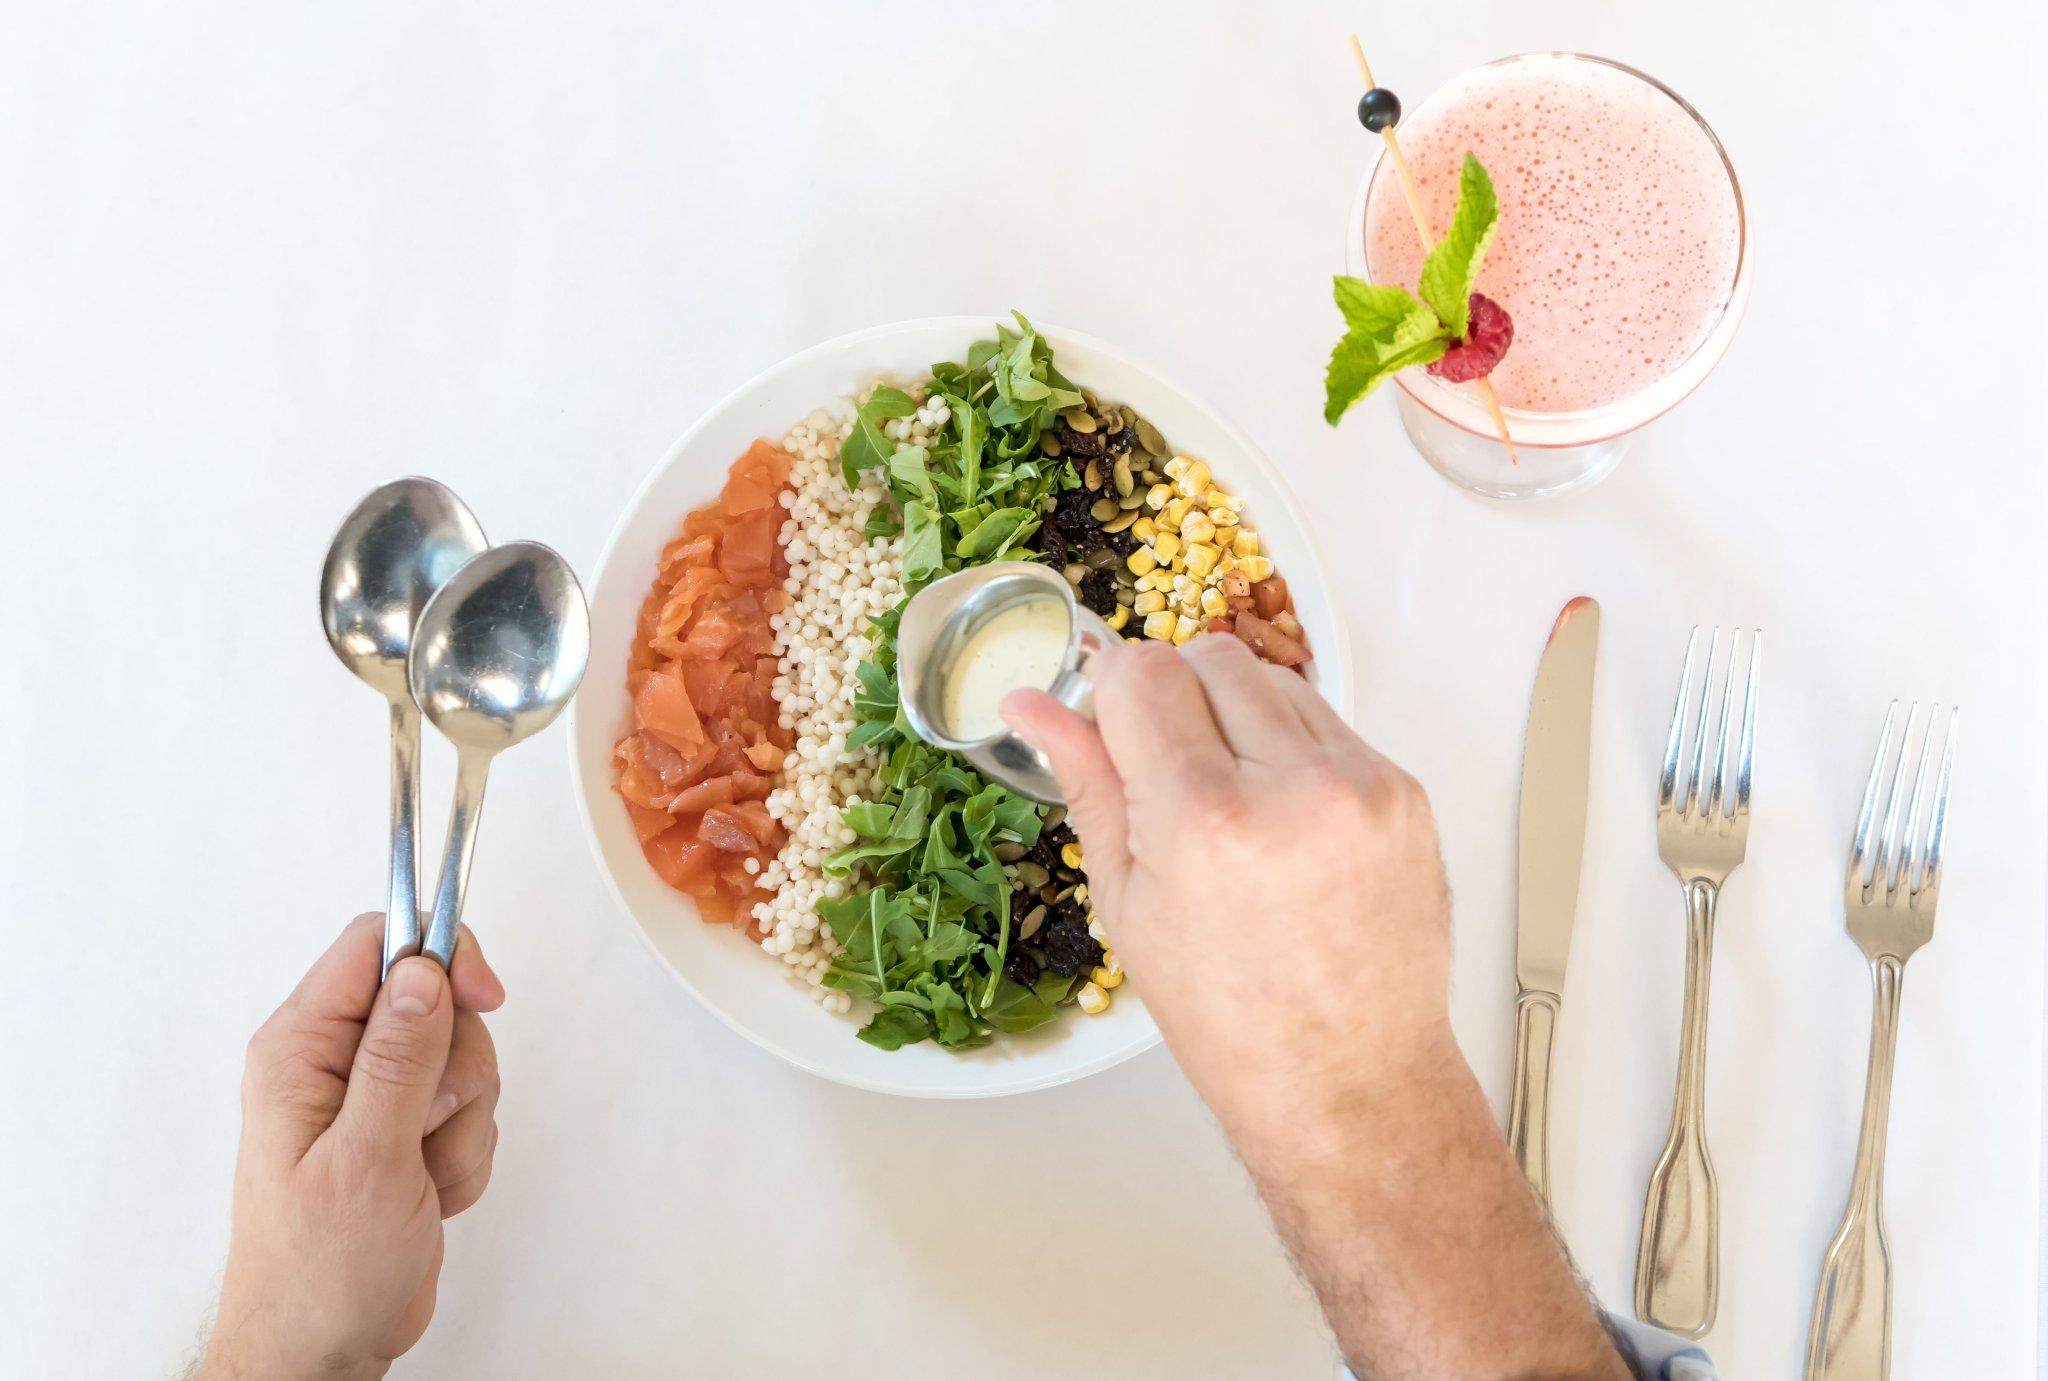 15 Best Restaurants in Scottsdale, Arizona